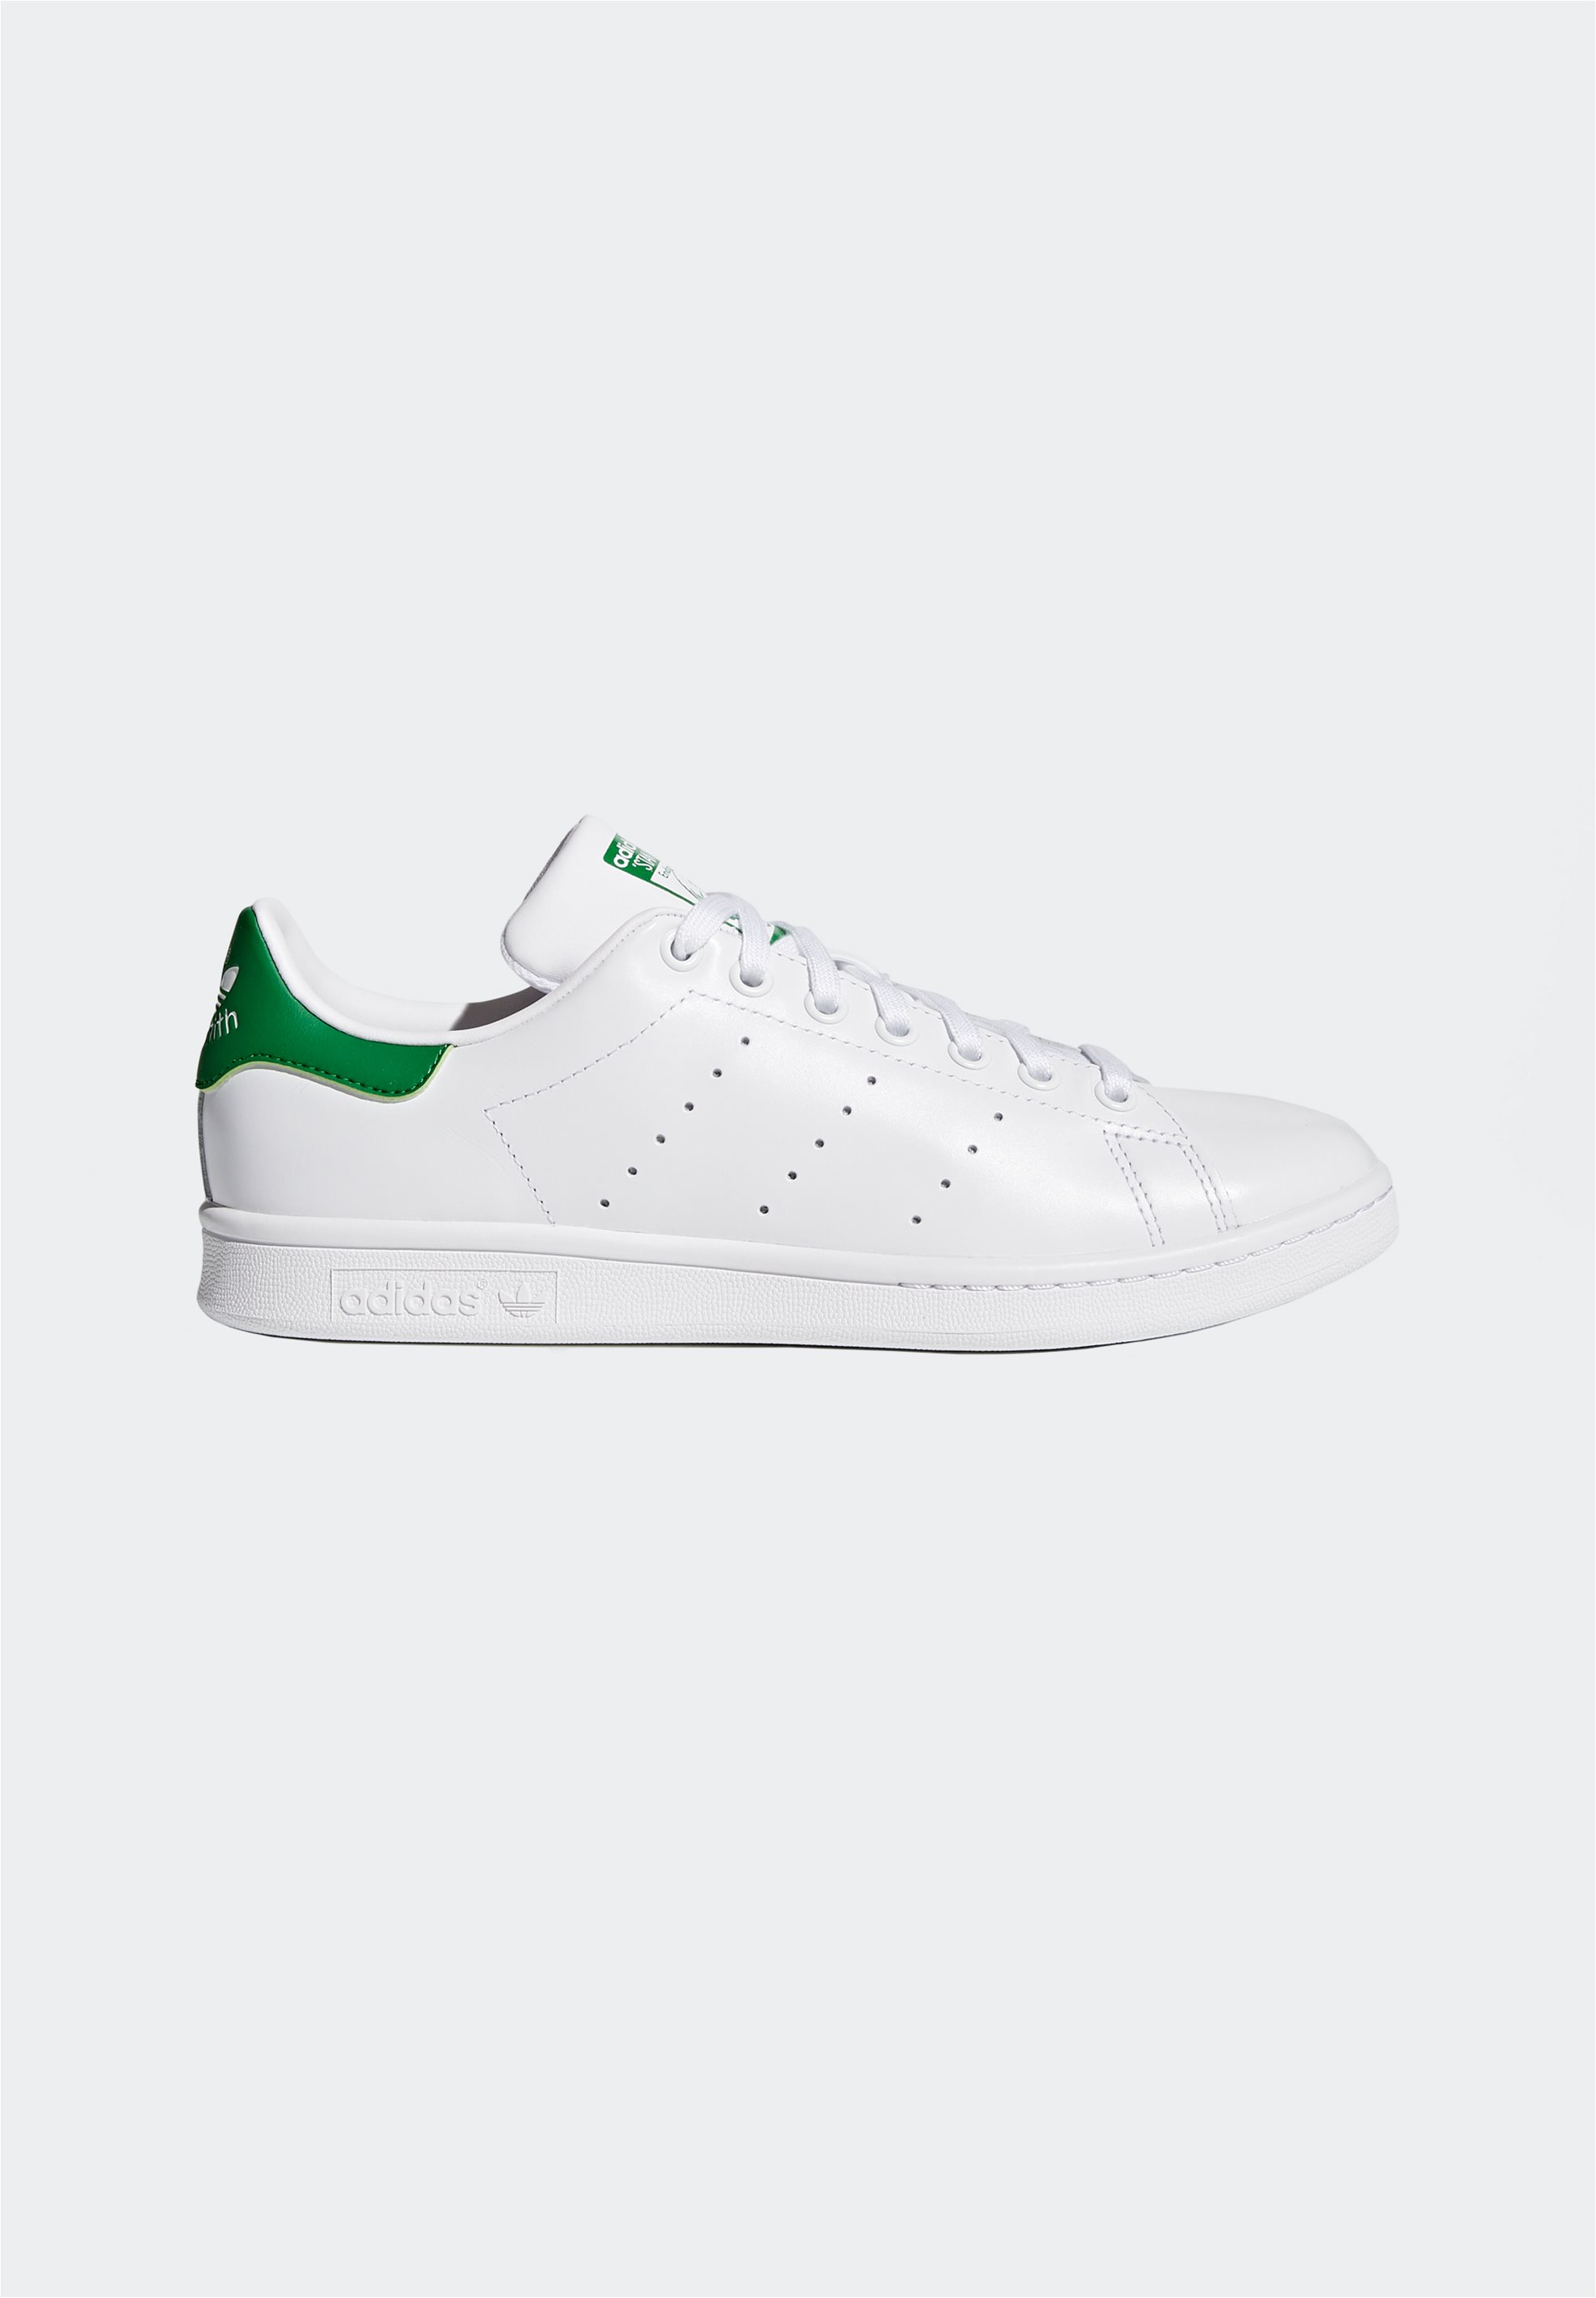 Adidas ανδρικά αθλητικά παπούτσια Stan Smith – M20324 – Λευκό